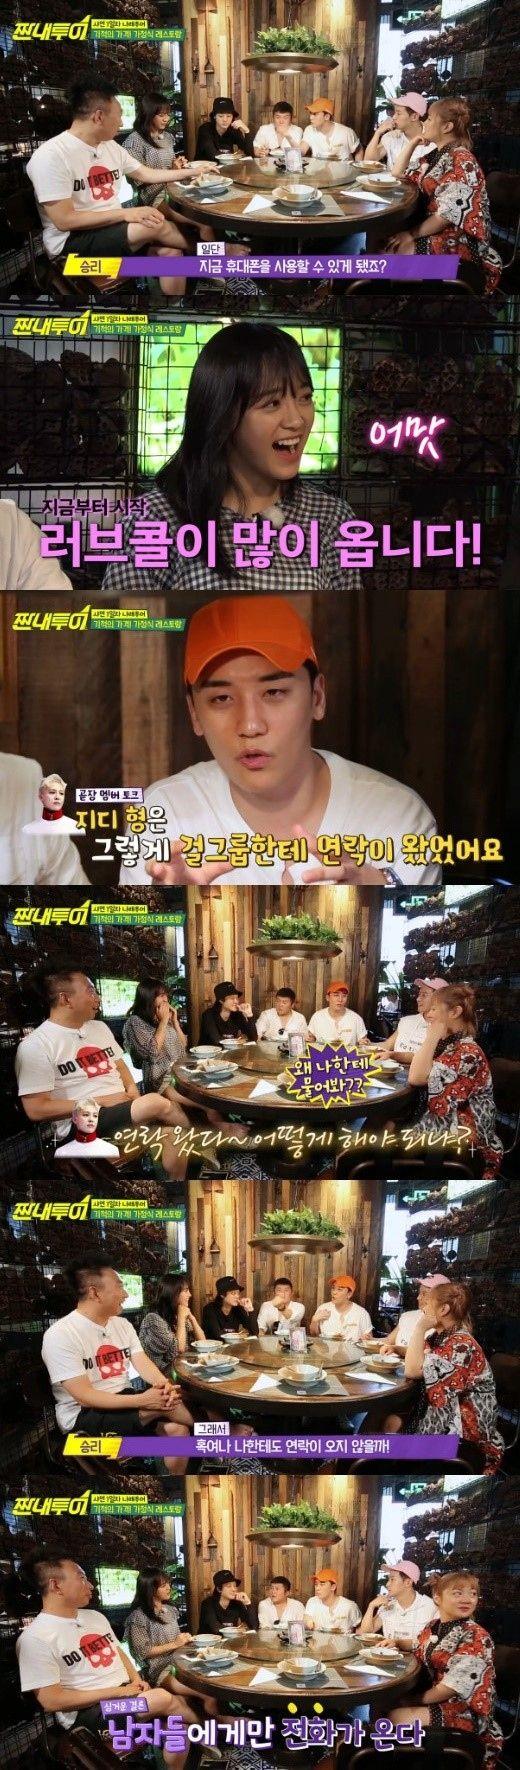 【BIGBANG NEWS】BIGBANGのV.I、G-DRAGONの人気を暴露「ガールズグループから電話が来ると…」